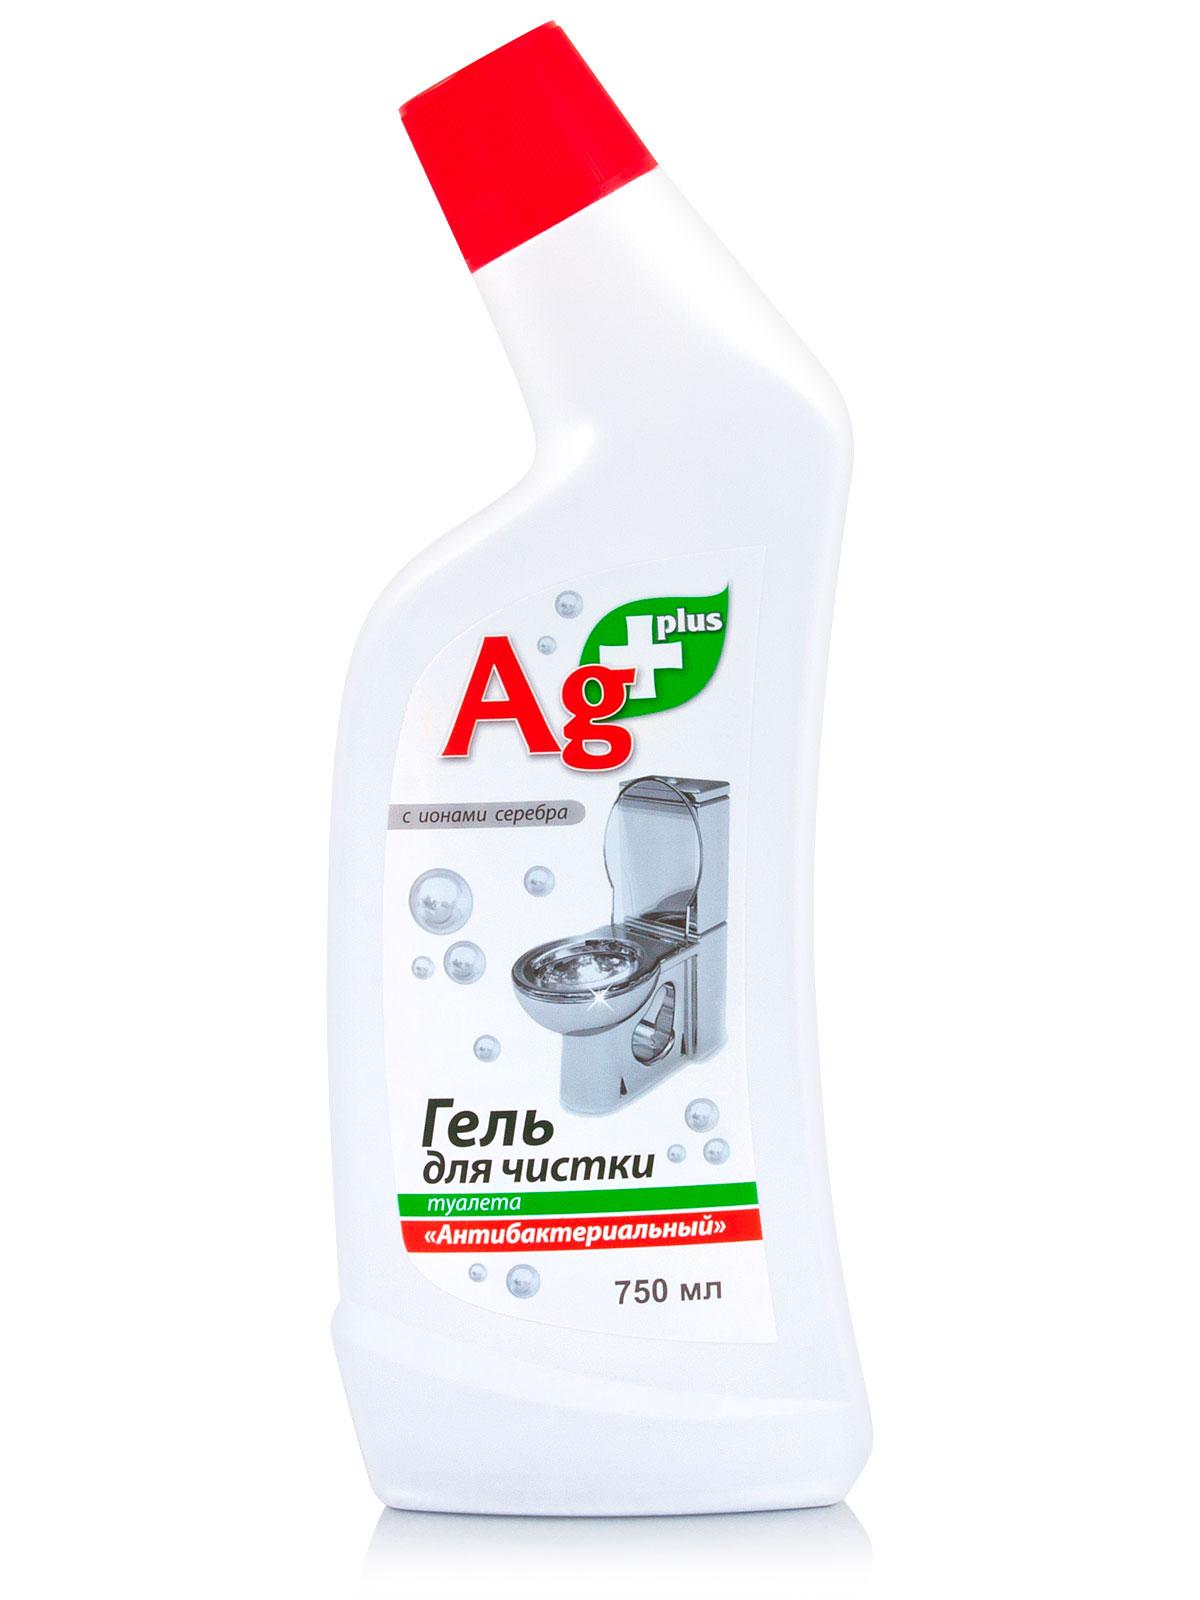 bio BIO Ag-plus Ag+ Антибактериальный 750мл (4823015926990)